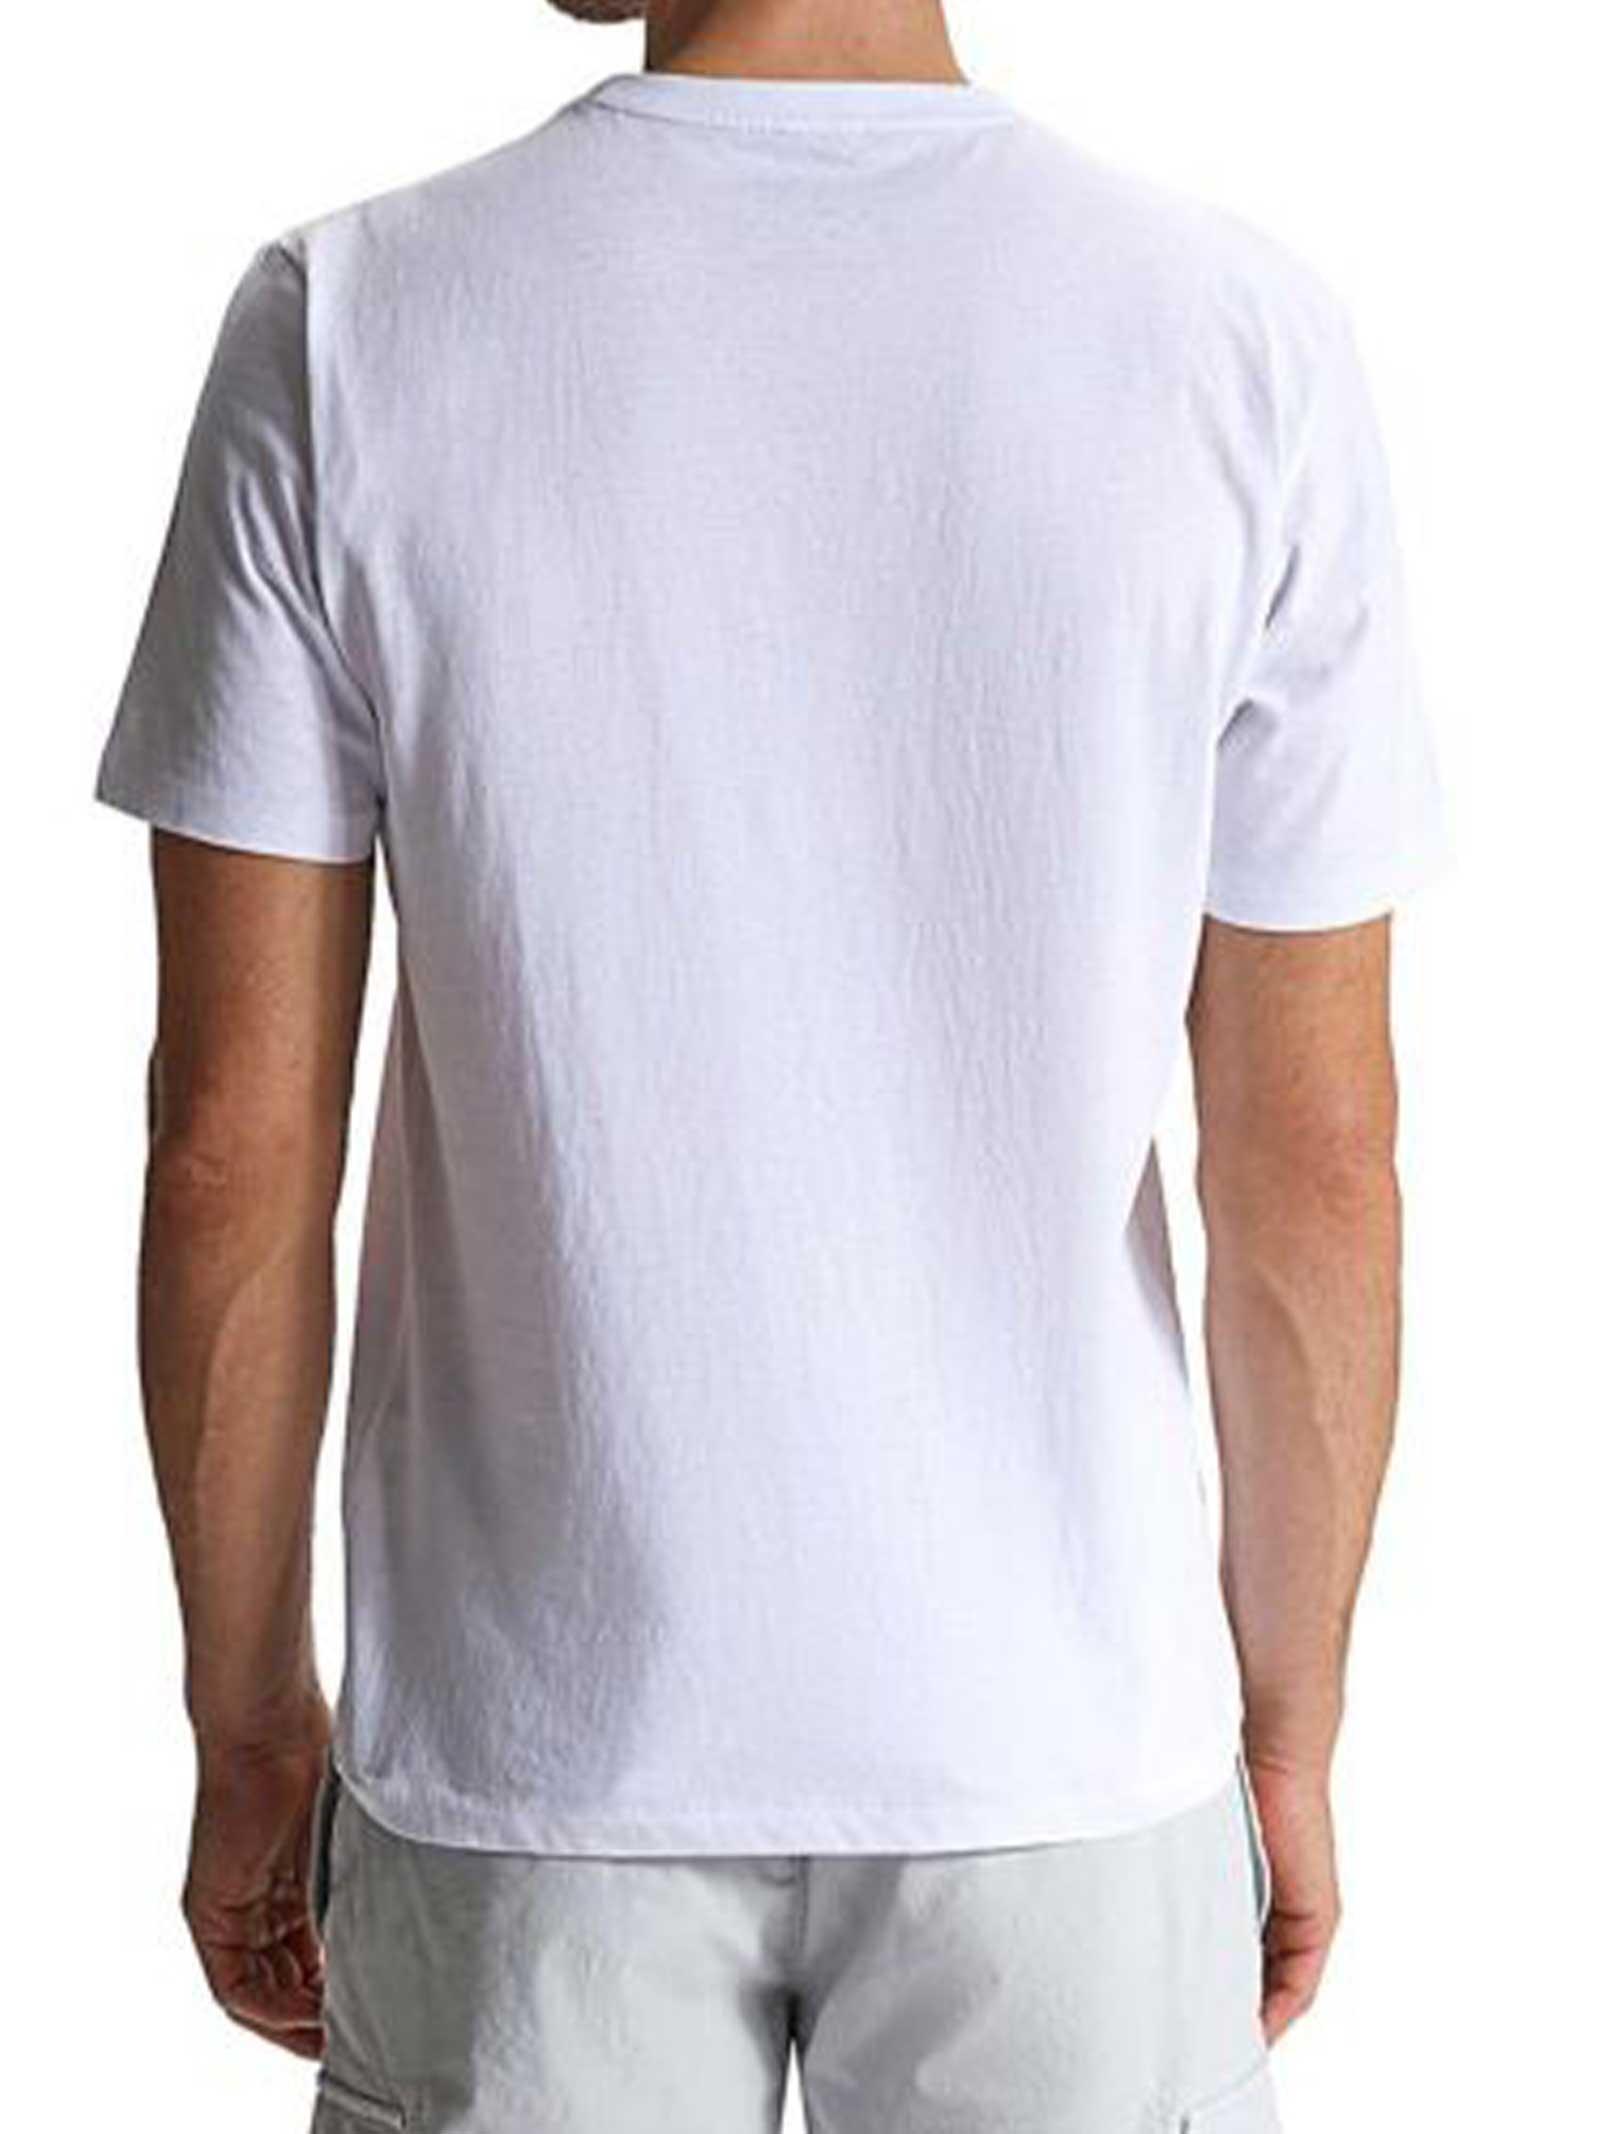 T-SHIRT UOMO NORTH SAILS   T-shirt   6926970101